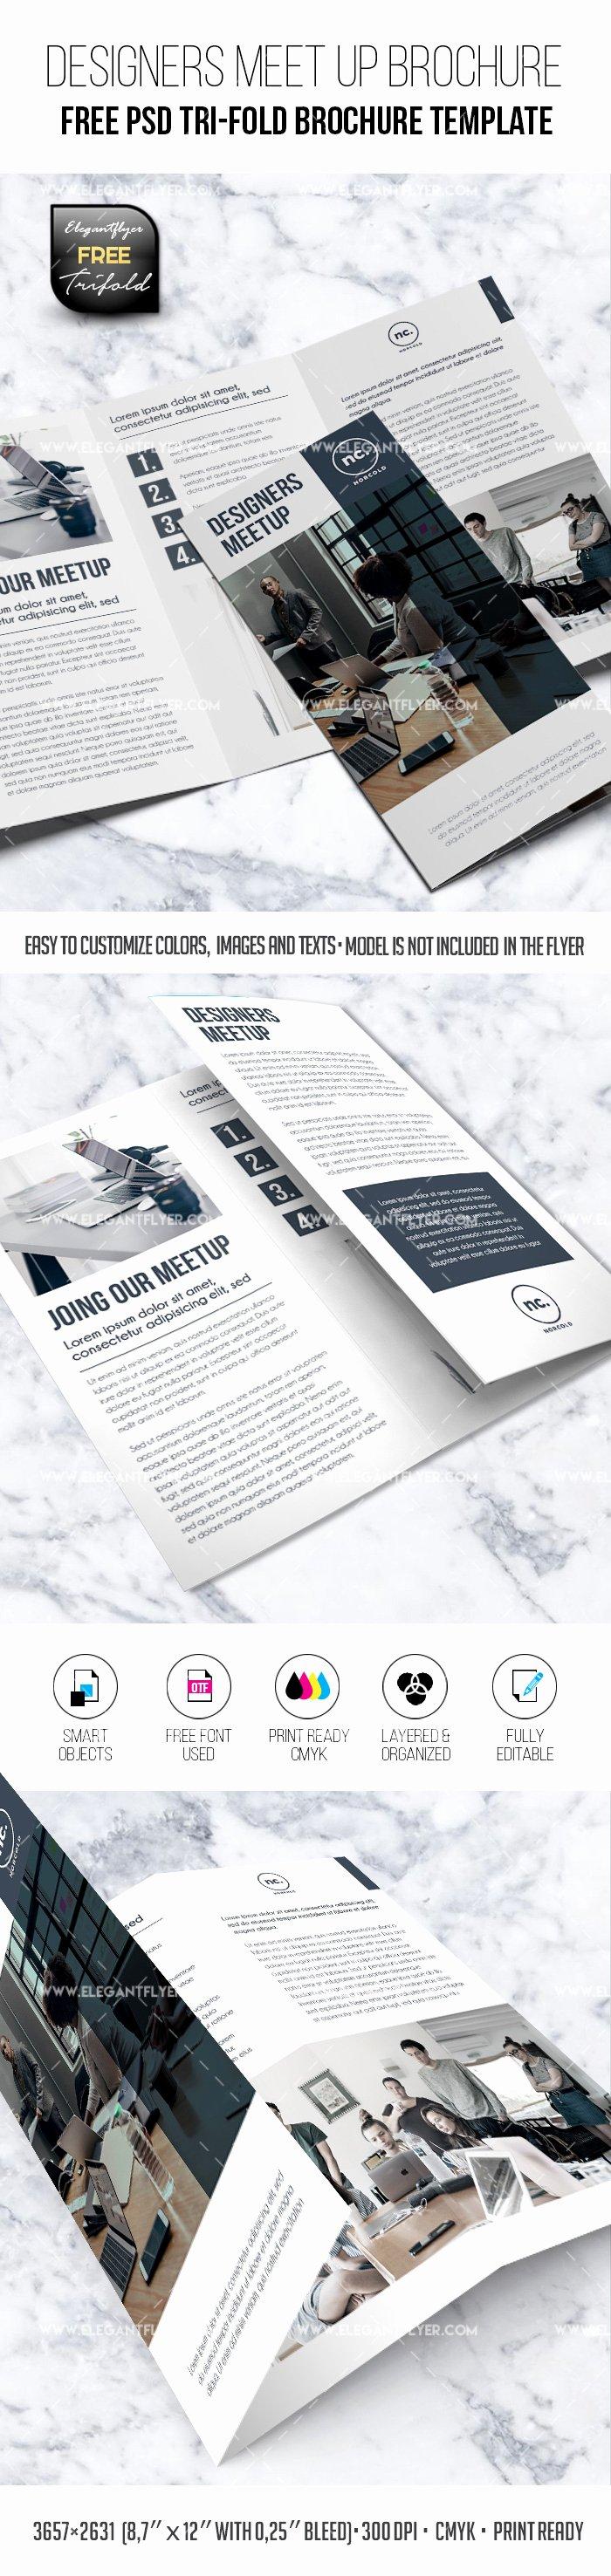 Tri Fold Brochure Template Psd Fresh Designers Meet Up – Free Psd Tri Fold Brochure Template – by Elegantflyer